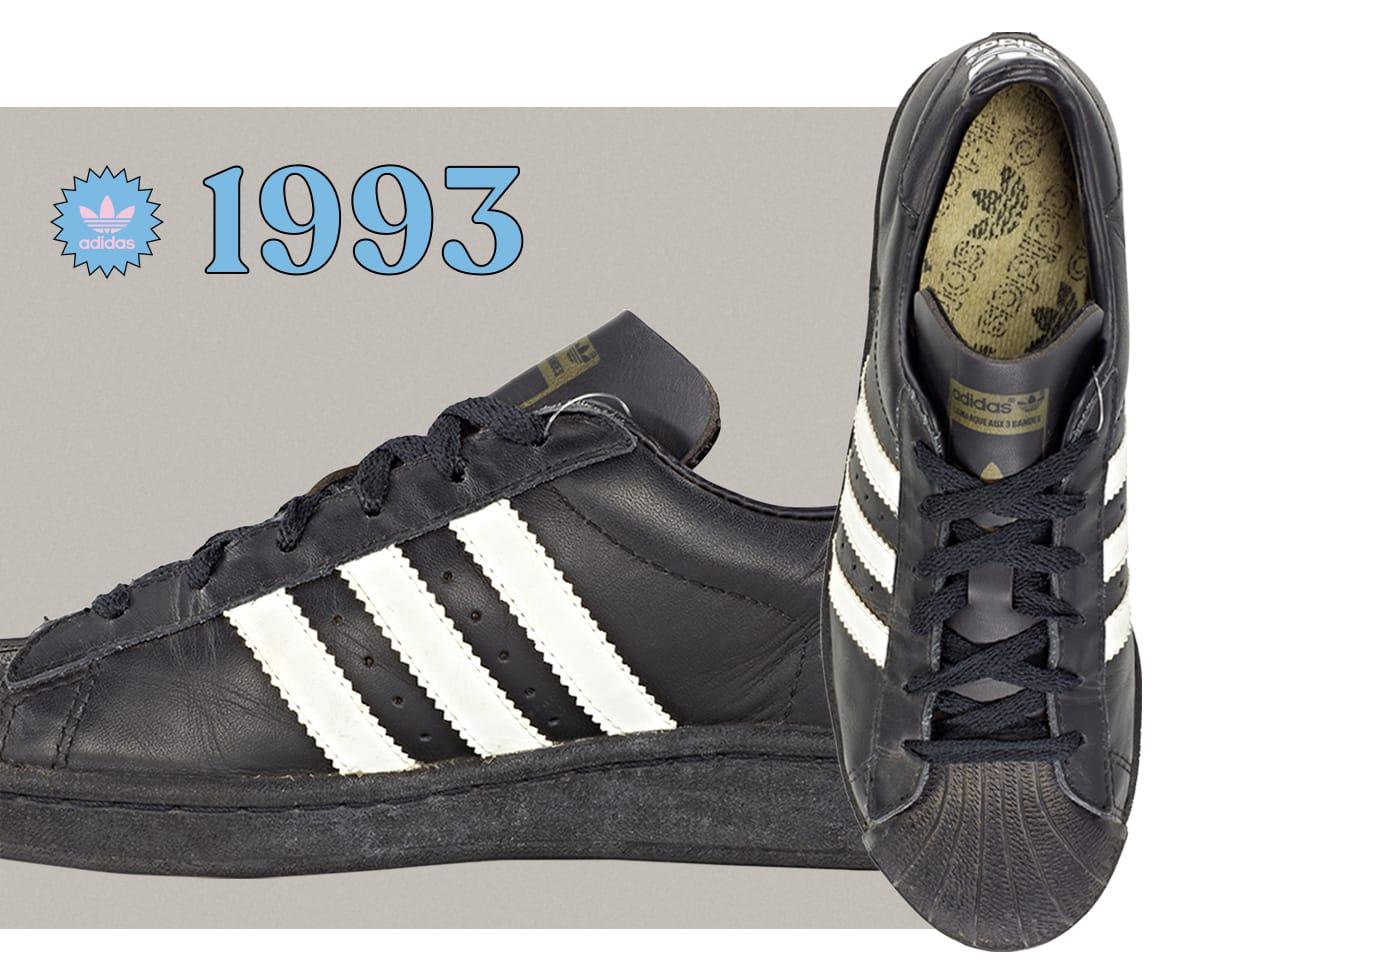 Superstar SchuheAt Adidas SchuheAt Adidas Adidas Superstar SchuheAt Adidas SchuheAt Superstar Superstar Adidas F1lKJcT